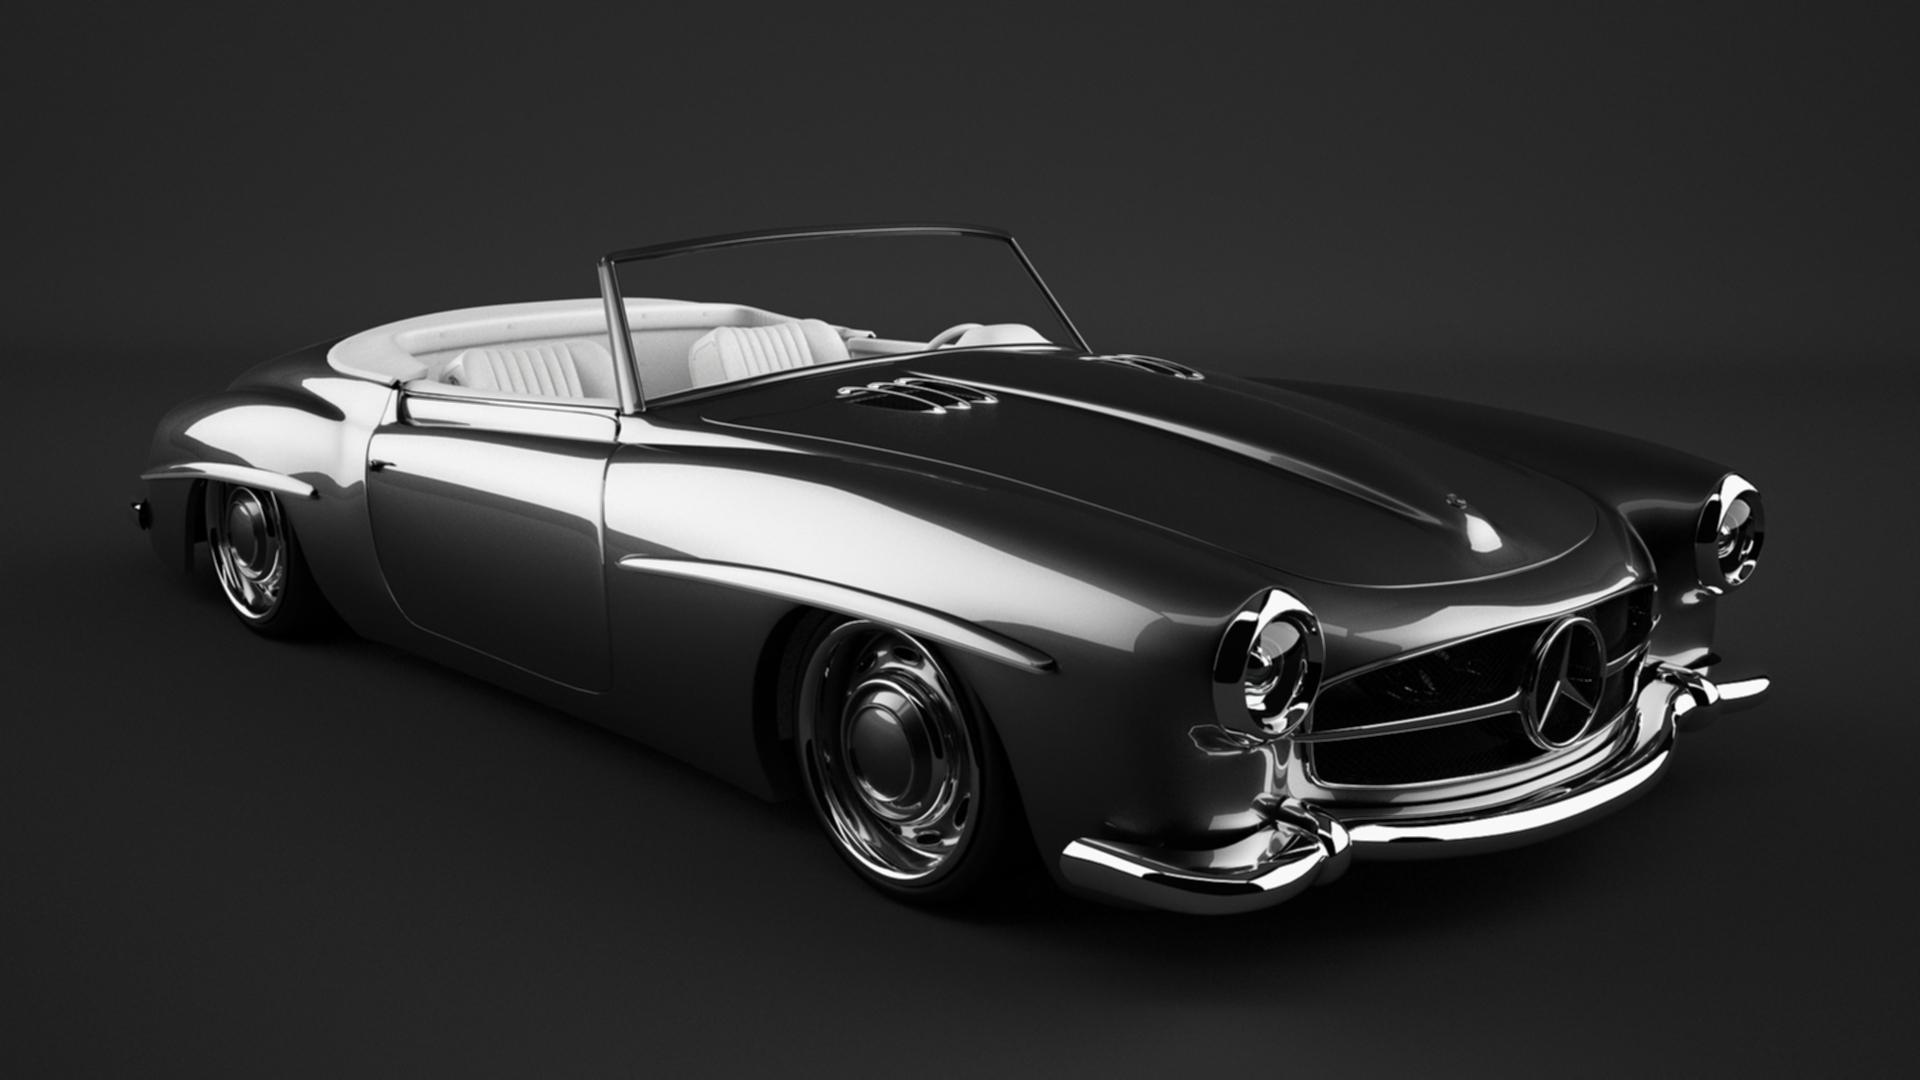 1961 mercedes 190sl custom by bewsii on deviantart for Mercedes benz custom